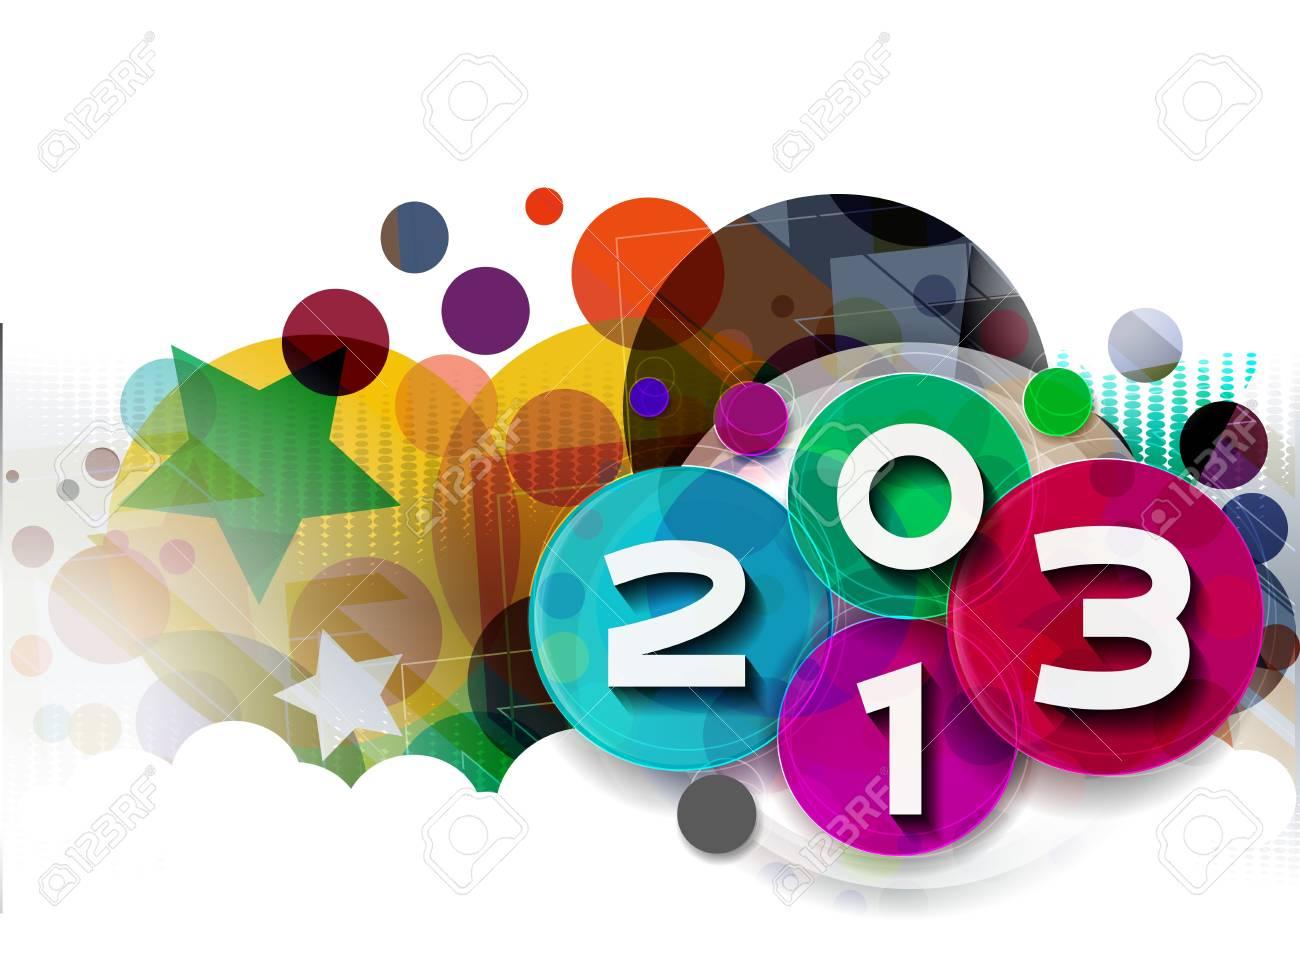 Happy new year 2013 celebration design. Stock Vector - 16818513